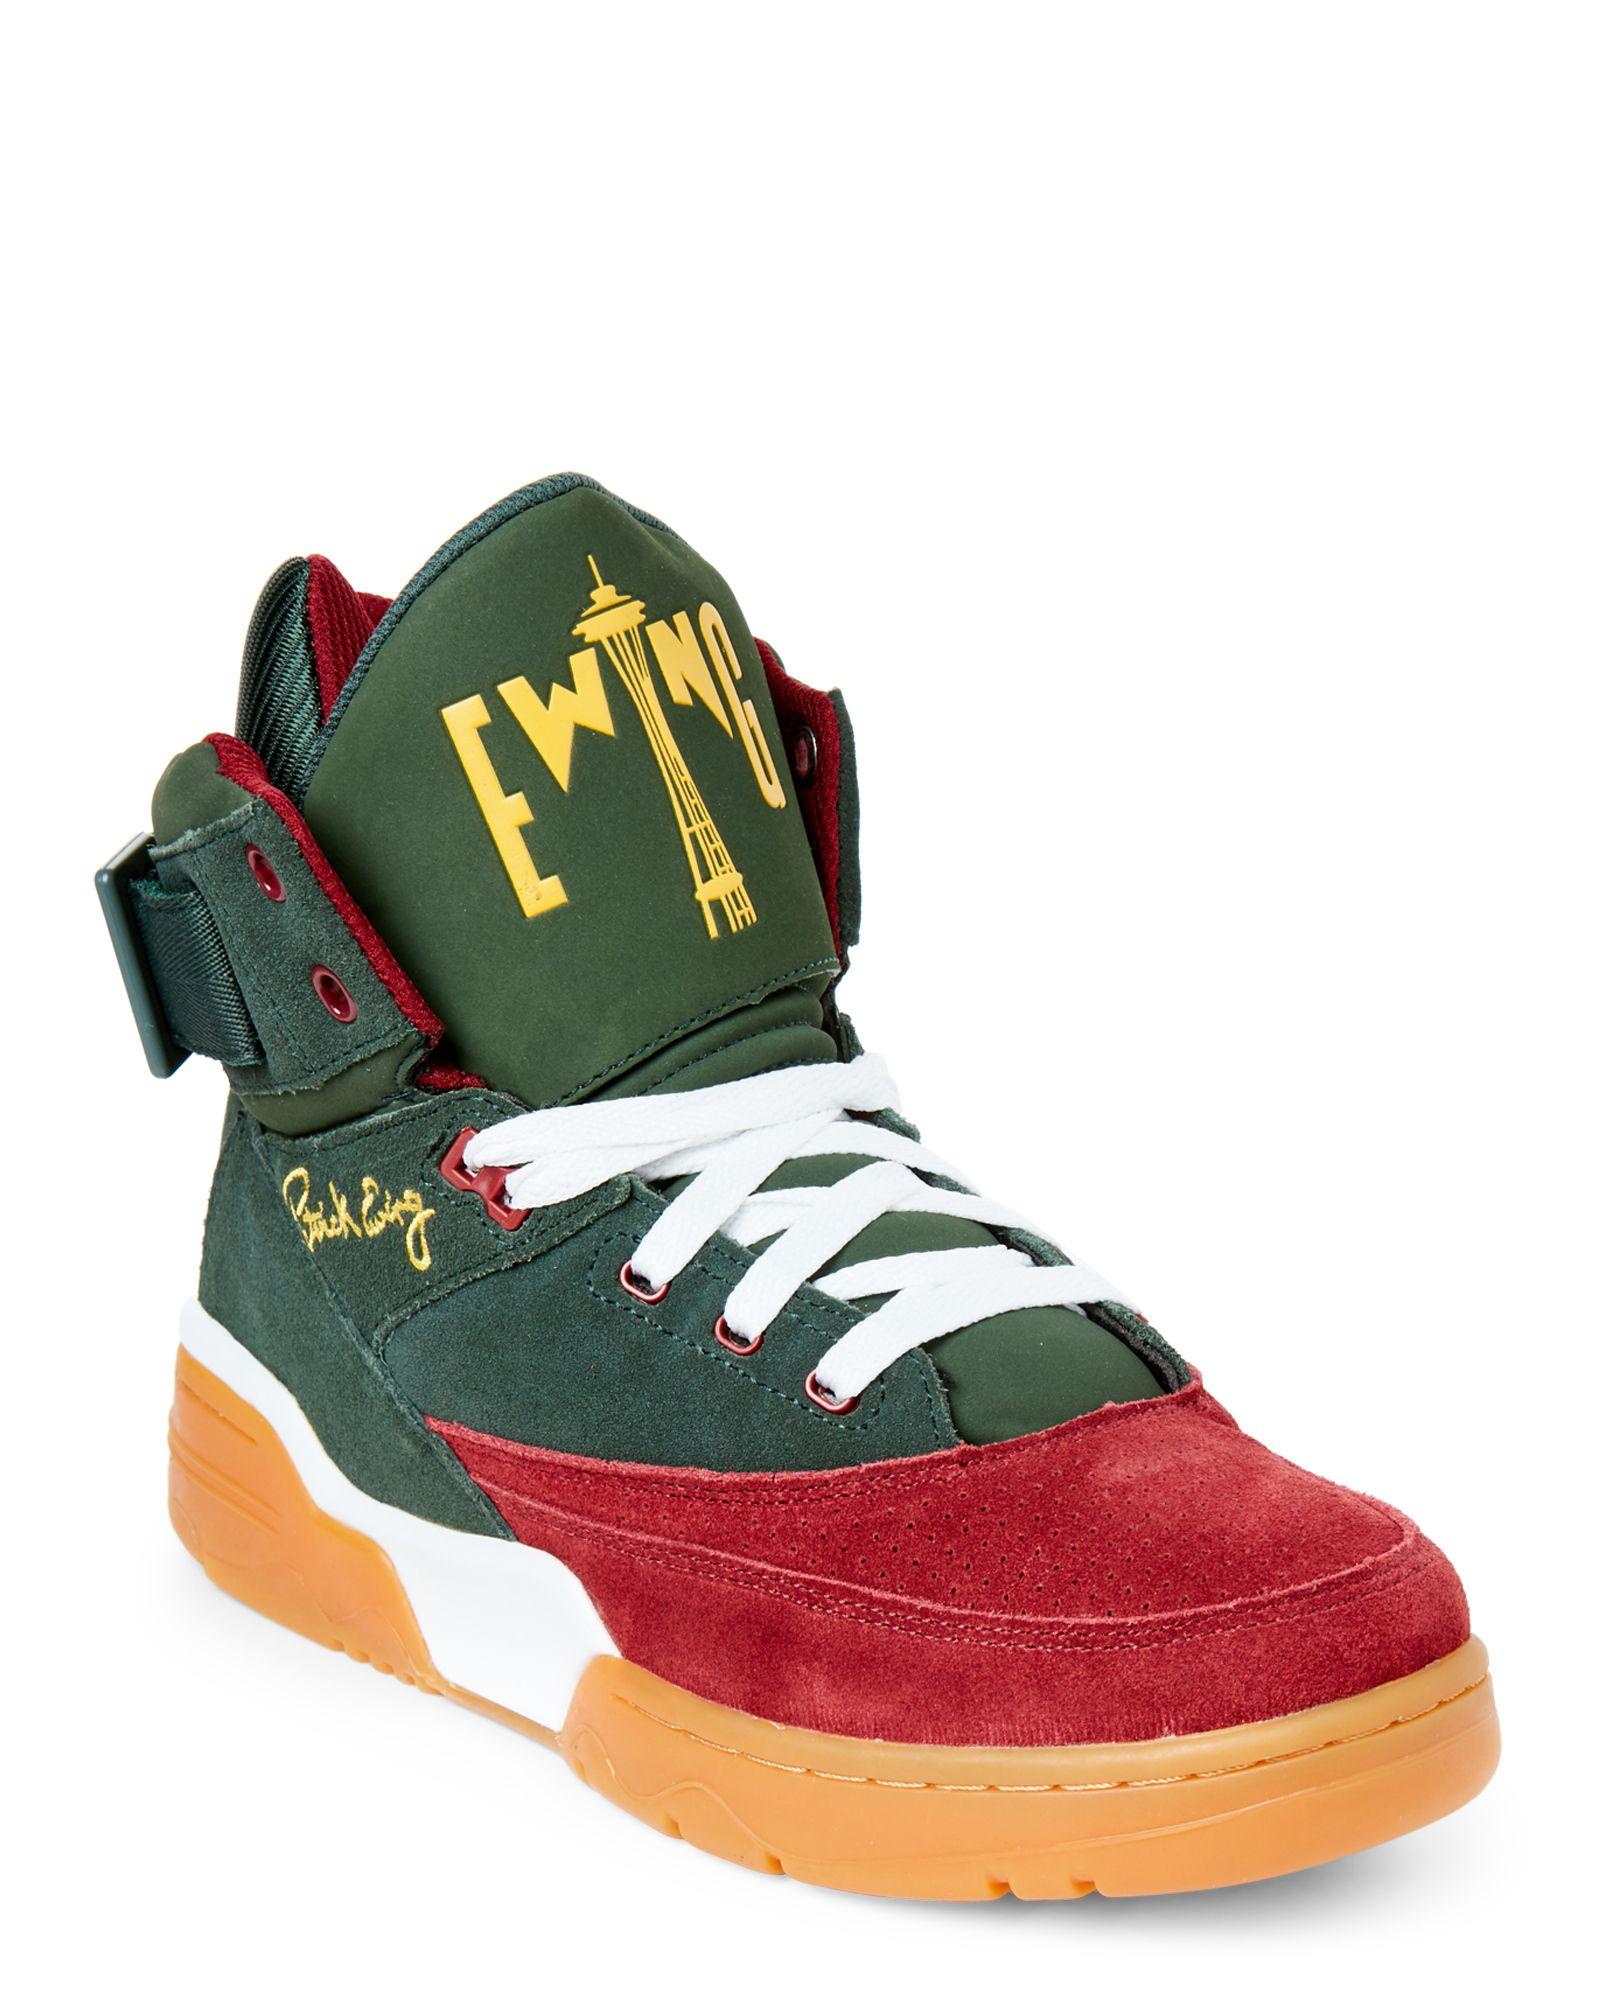 6ad214790dad Patrick Ewing Green   Maroon Ewing 33 High Top Sneakers